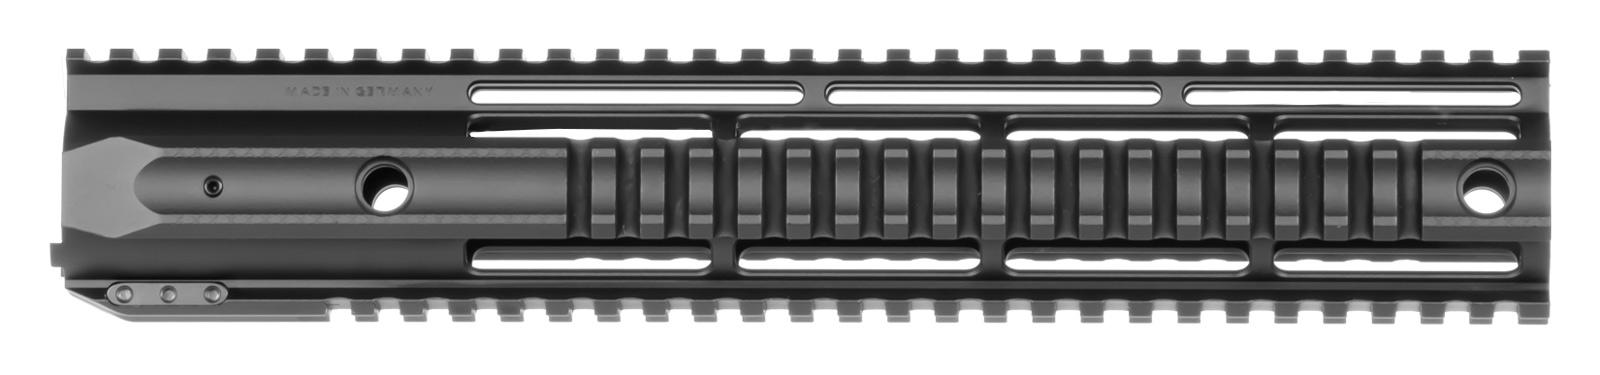 ar-15-rail-12-hera-arms-irs-gen-3-ar-15-handguard-rail-unmarked